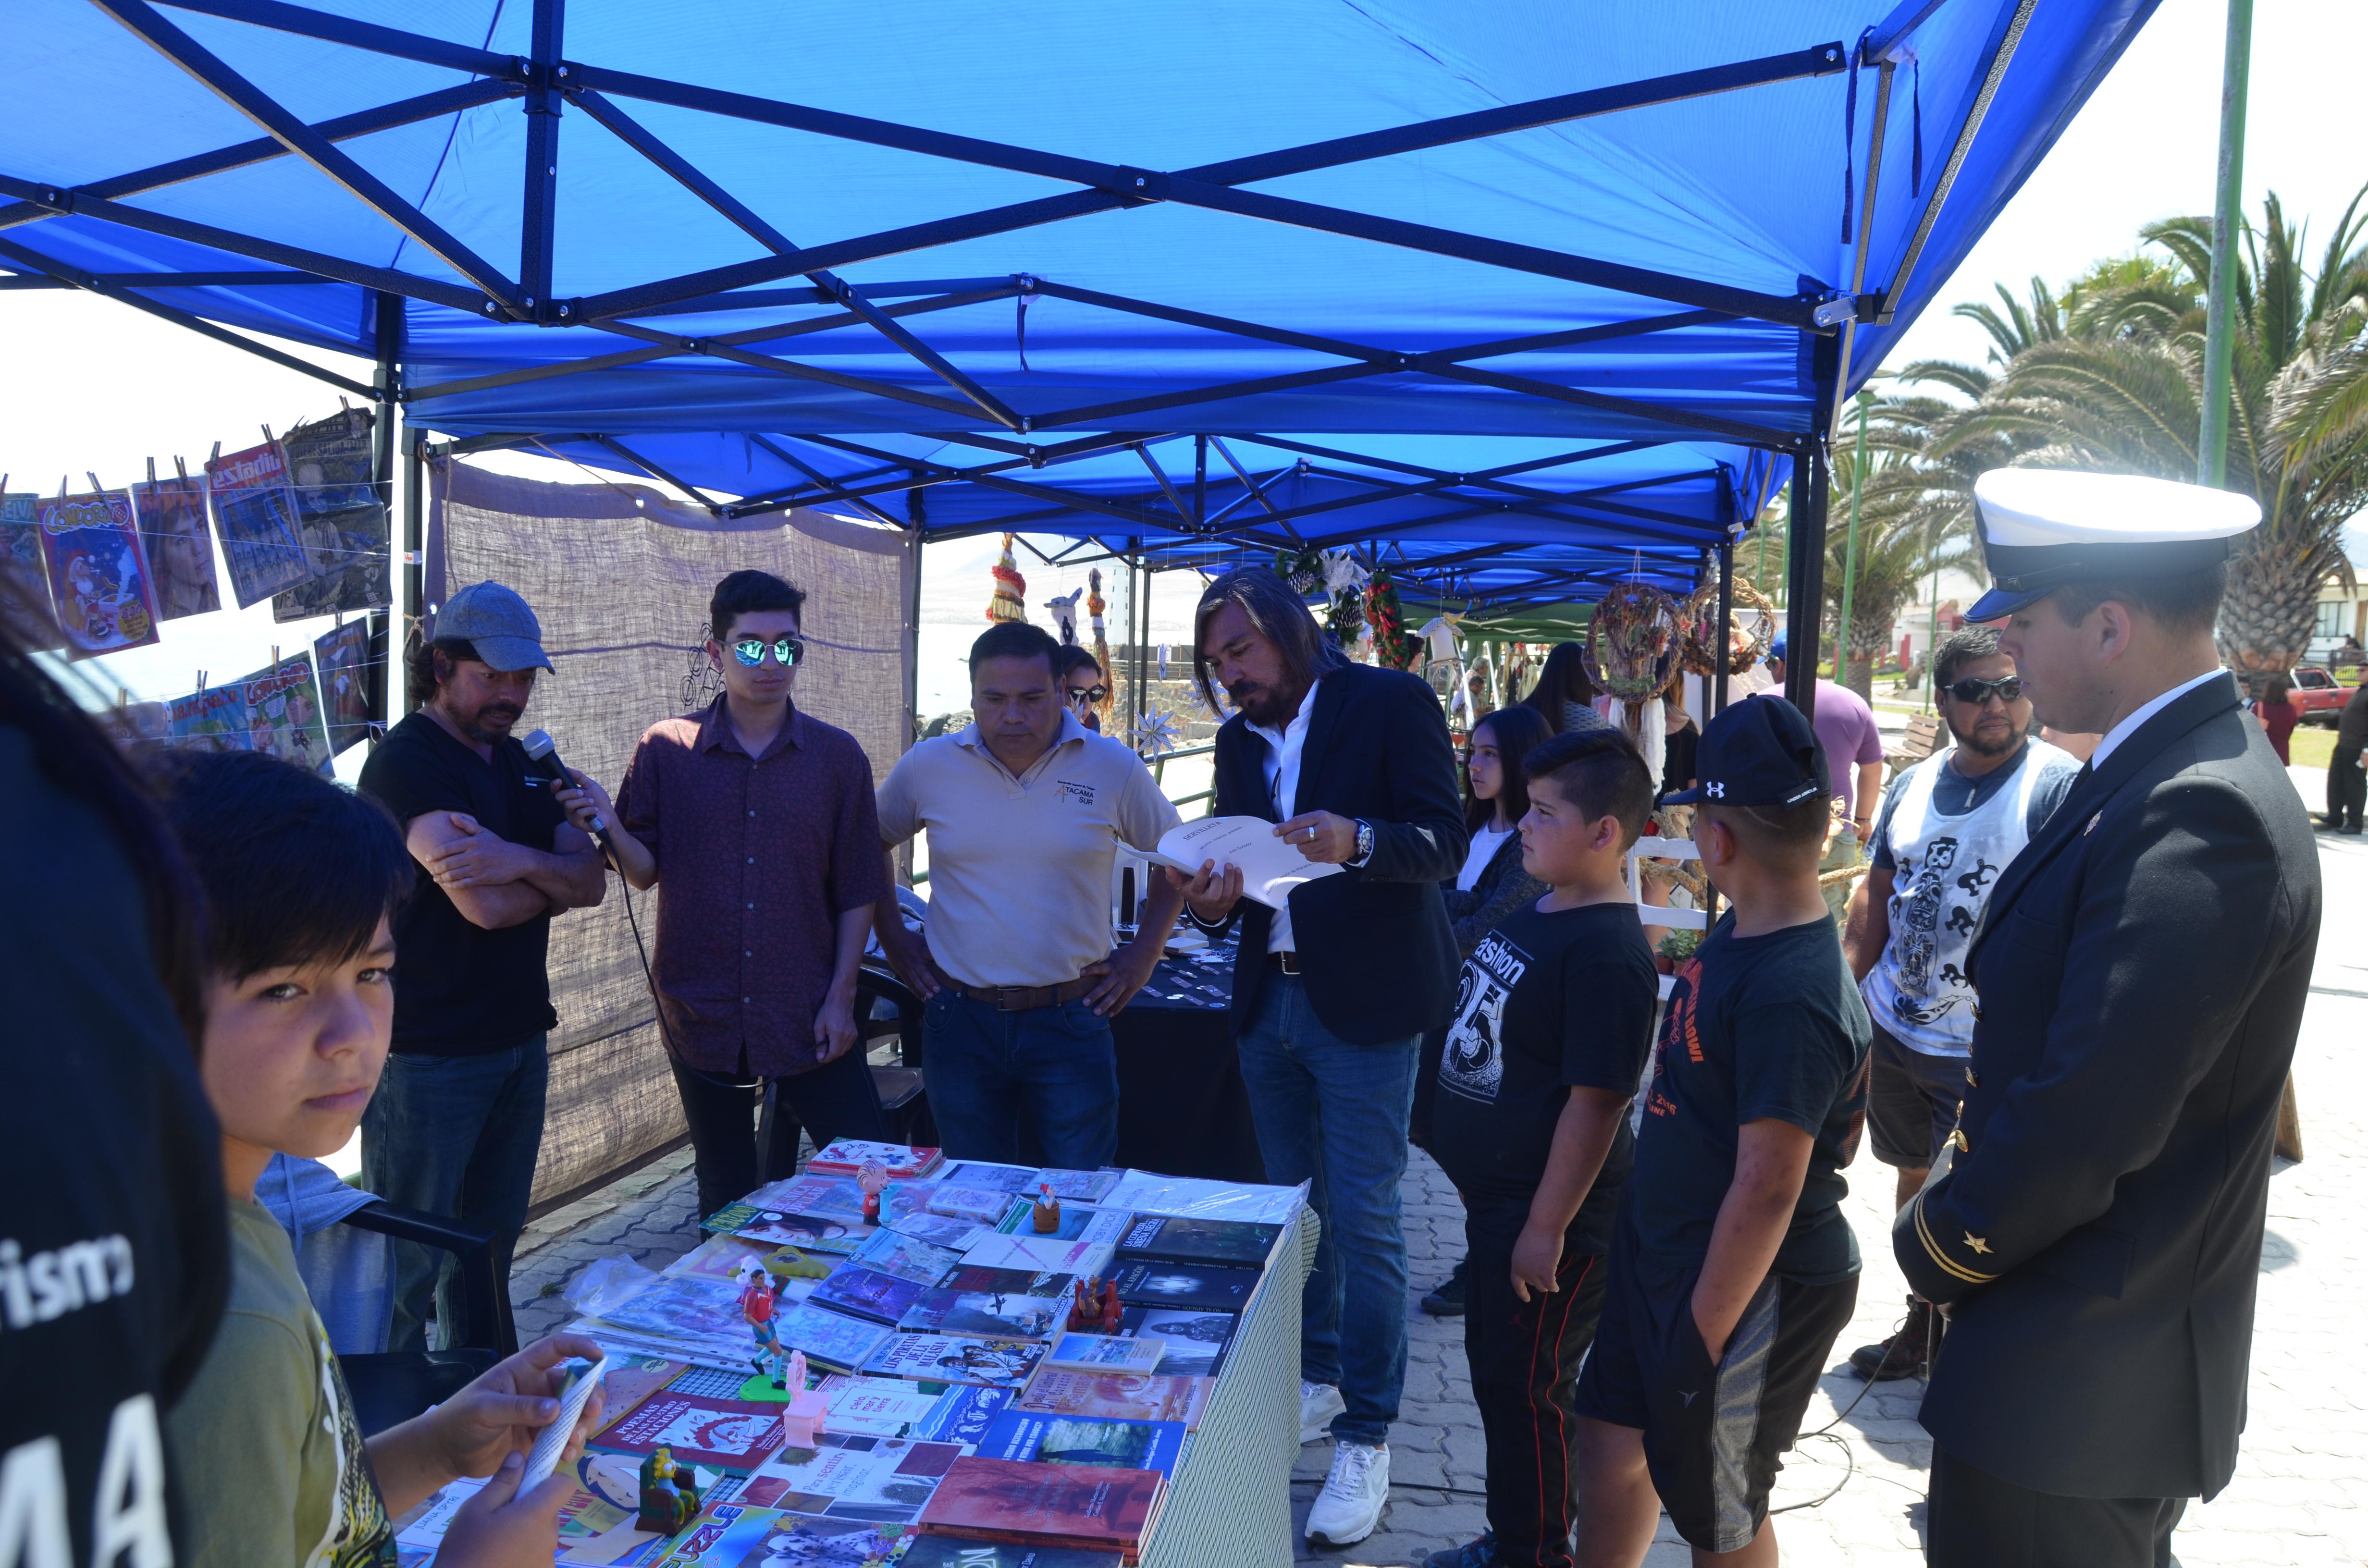 Municipio, Armada y Comerciantes de Huasco dan por inaugurada temporada de verano.